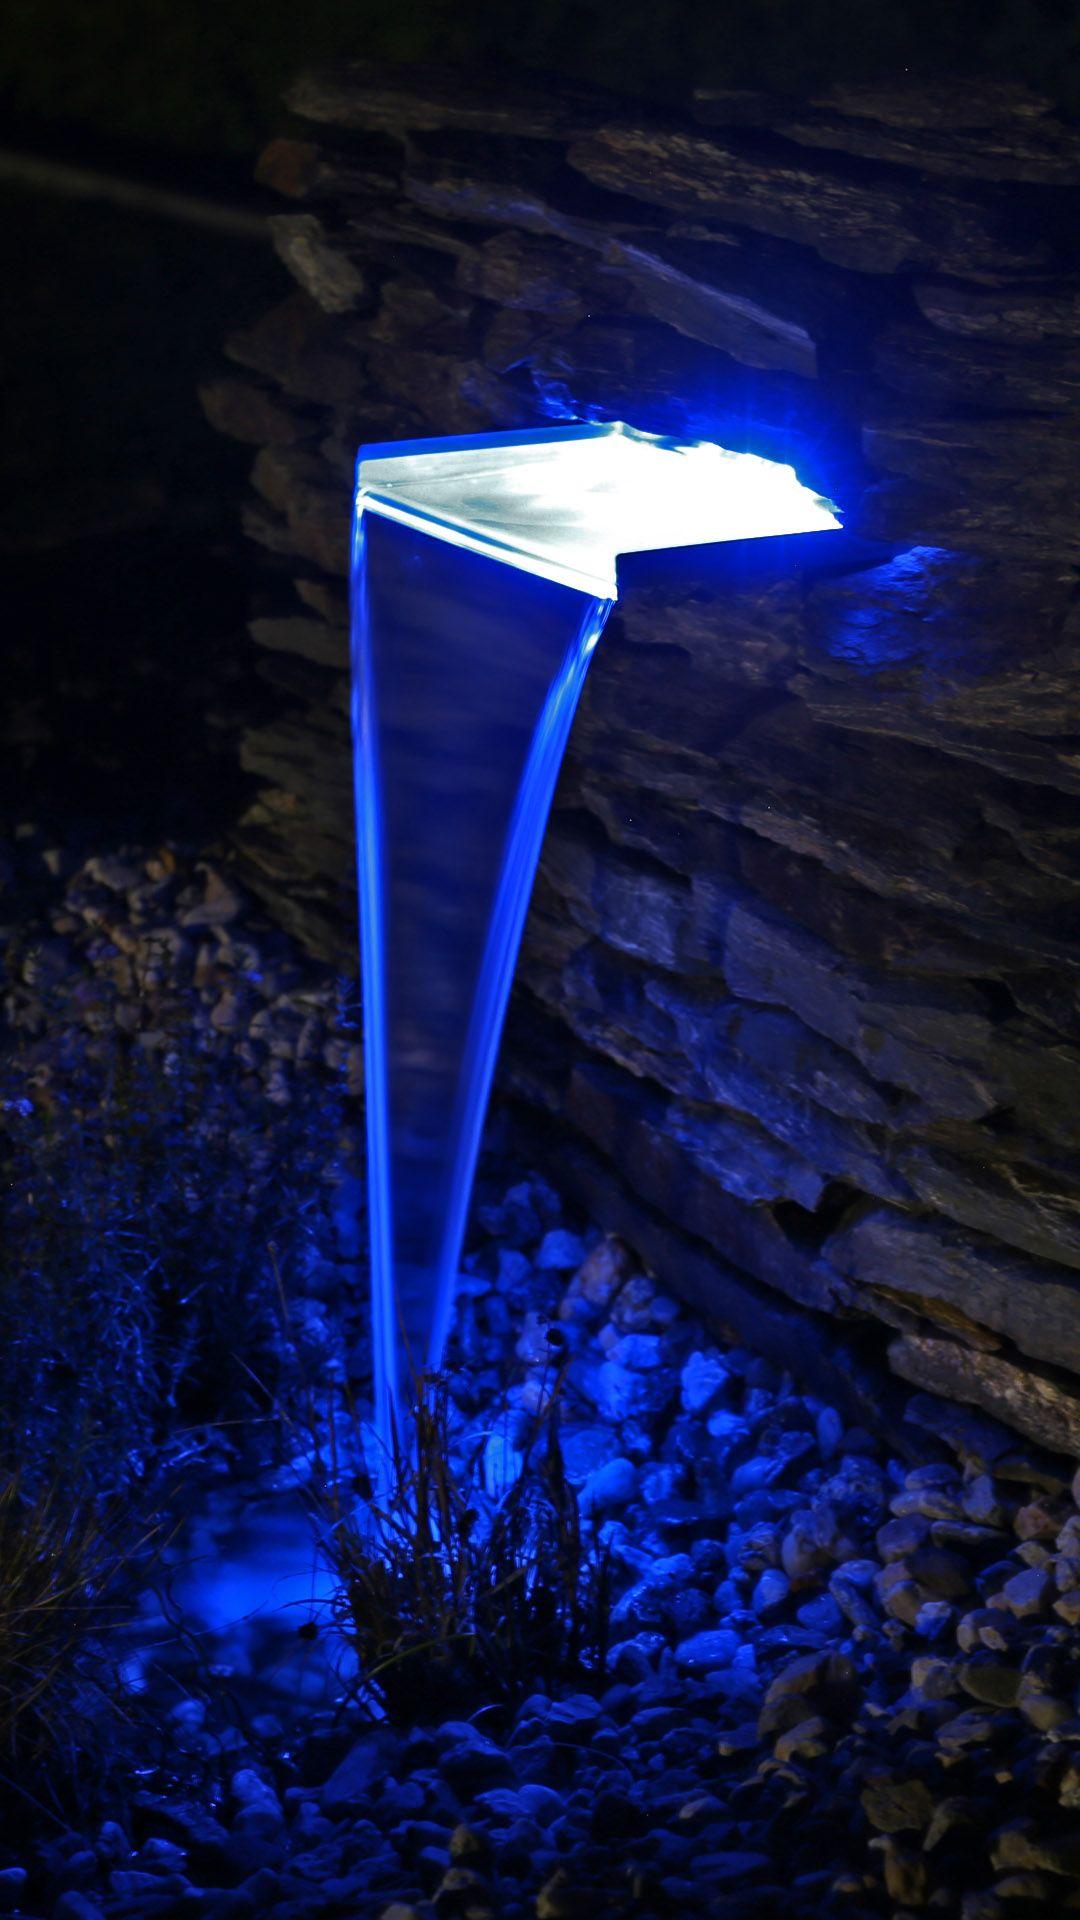 Garten Wasserfall Mit Led Beleuchtung In 2020 Pool Beleuchtung Beleuchtung Led Beleuchtung